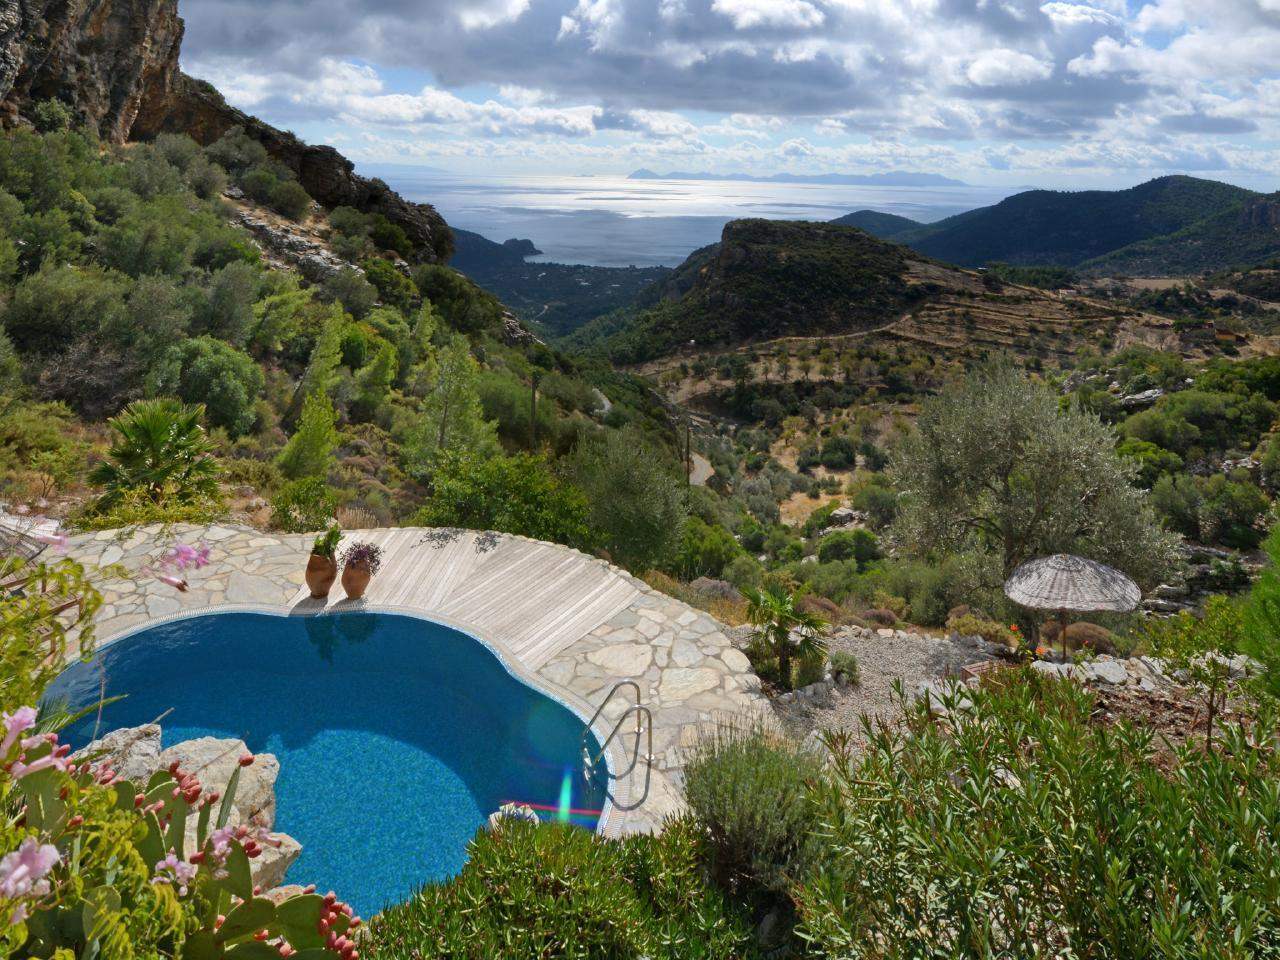 Maison de vacances Exklusives Chalet, romantisch am Berghang und Meer gelegen (2506674), Mesudiye, , Région Egéenne, Turquie, image 18